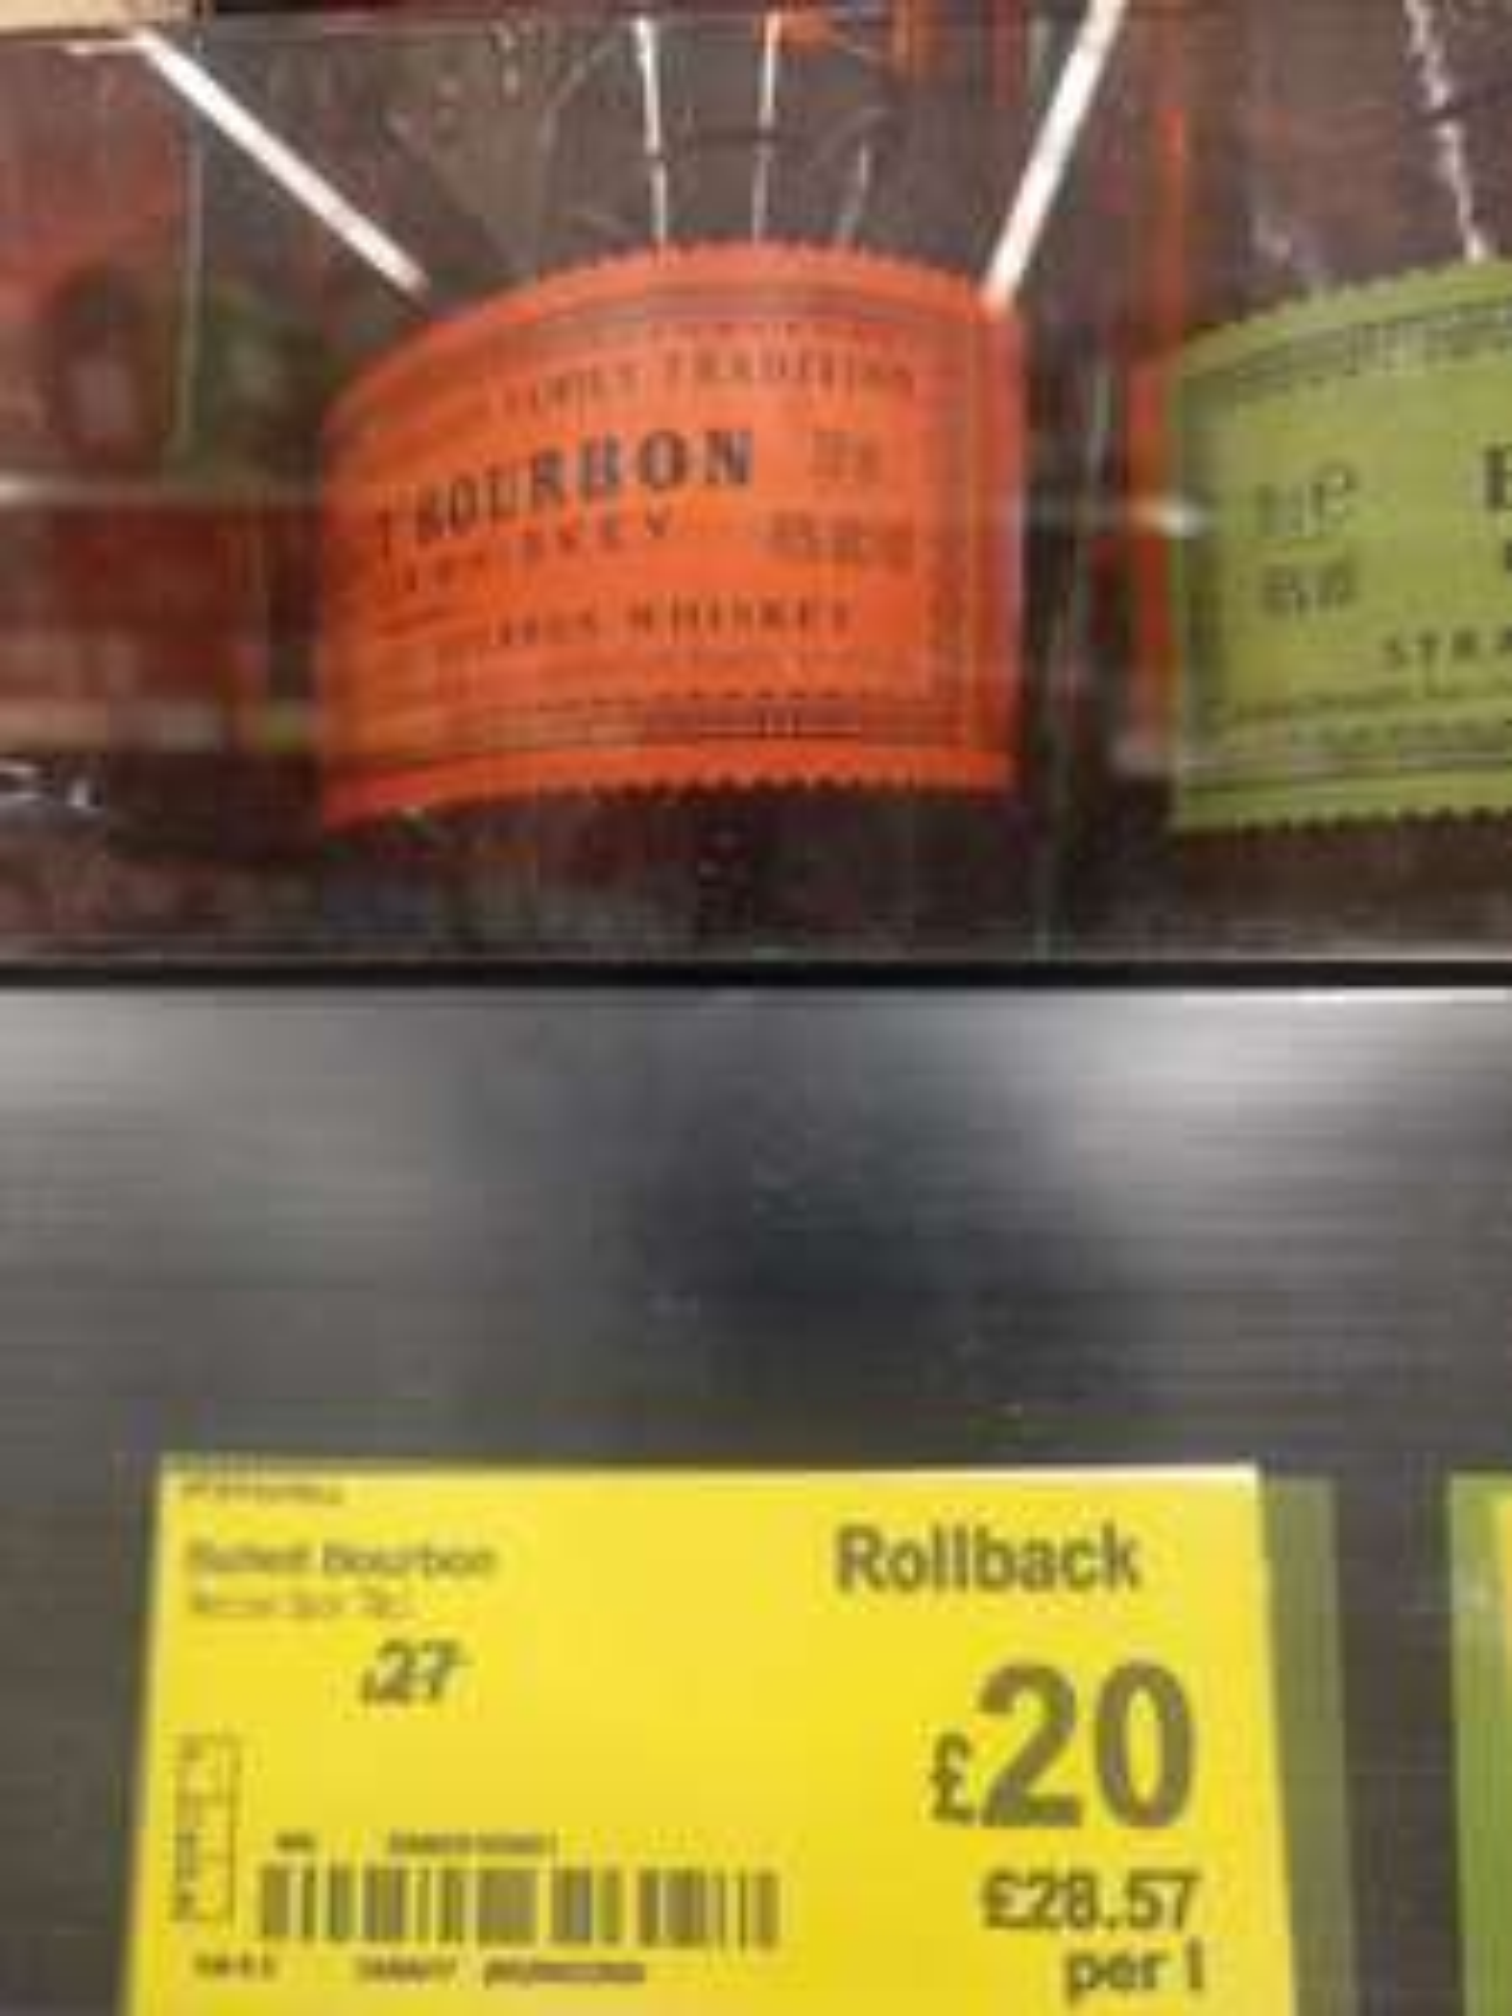 Bulleit Bourbon at Asda for £20